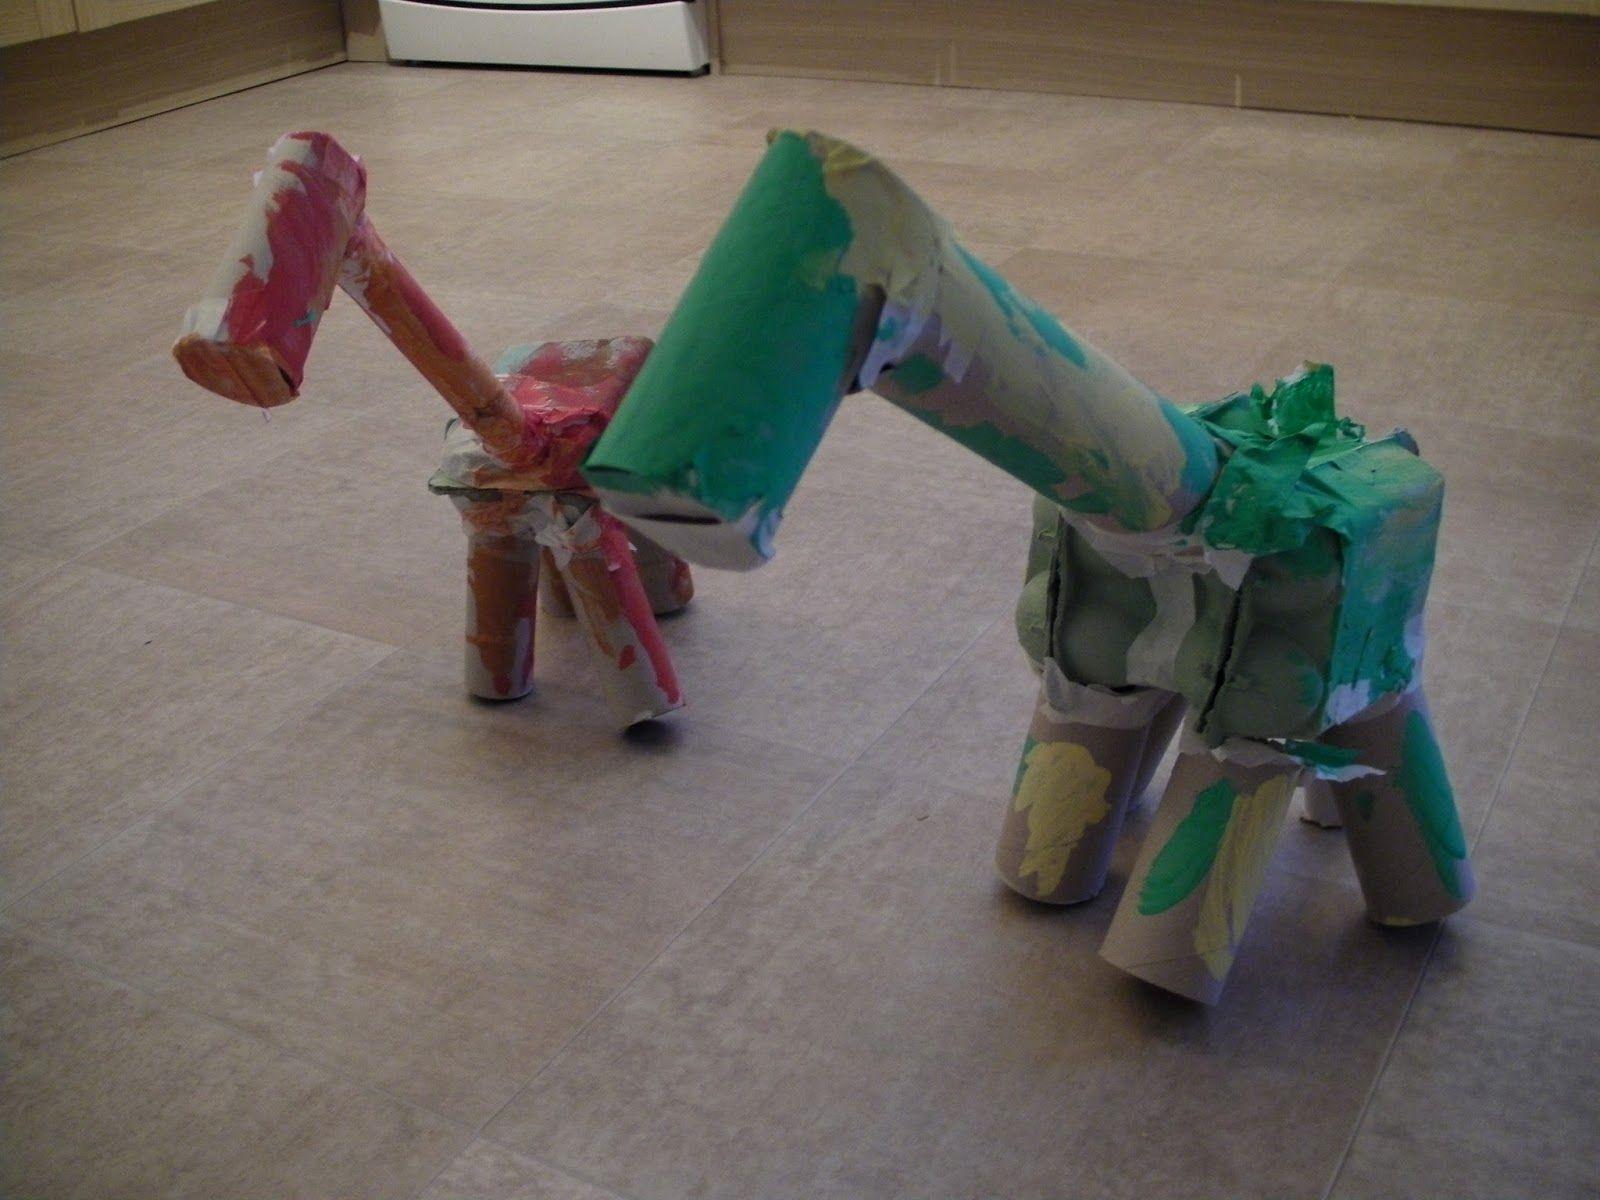 Crafty Mummy To 2 Animal Junk Modelling Junk Modelling Dinosaur Projects Dinosaur Theme